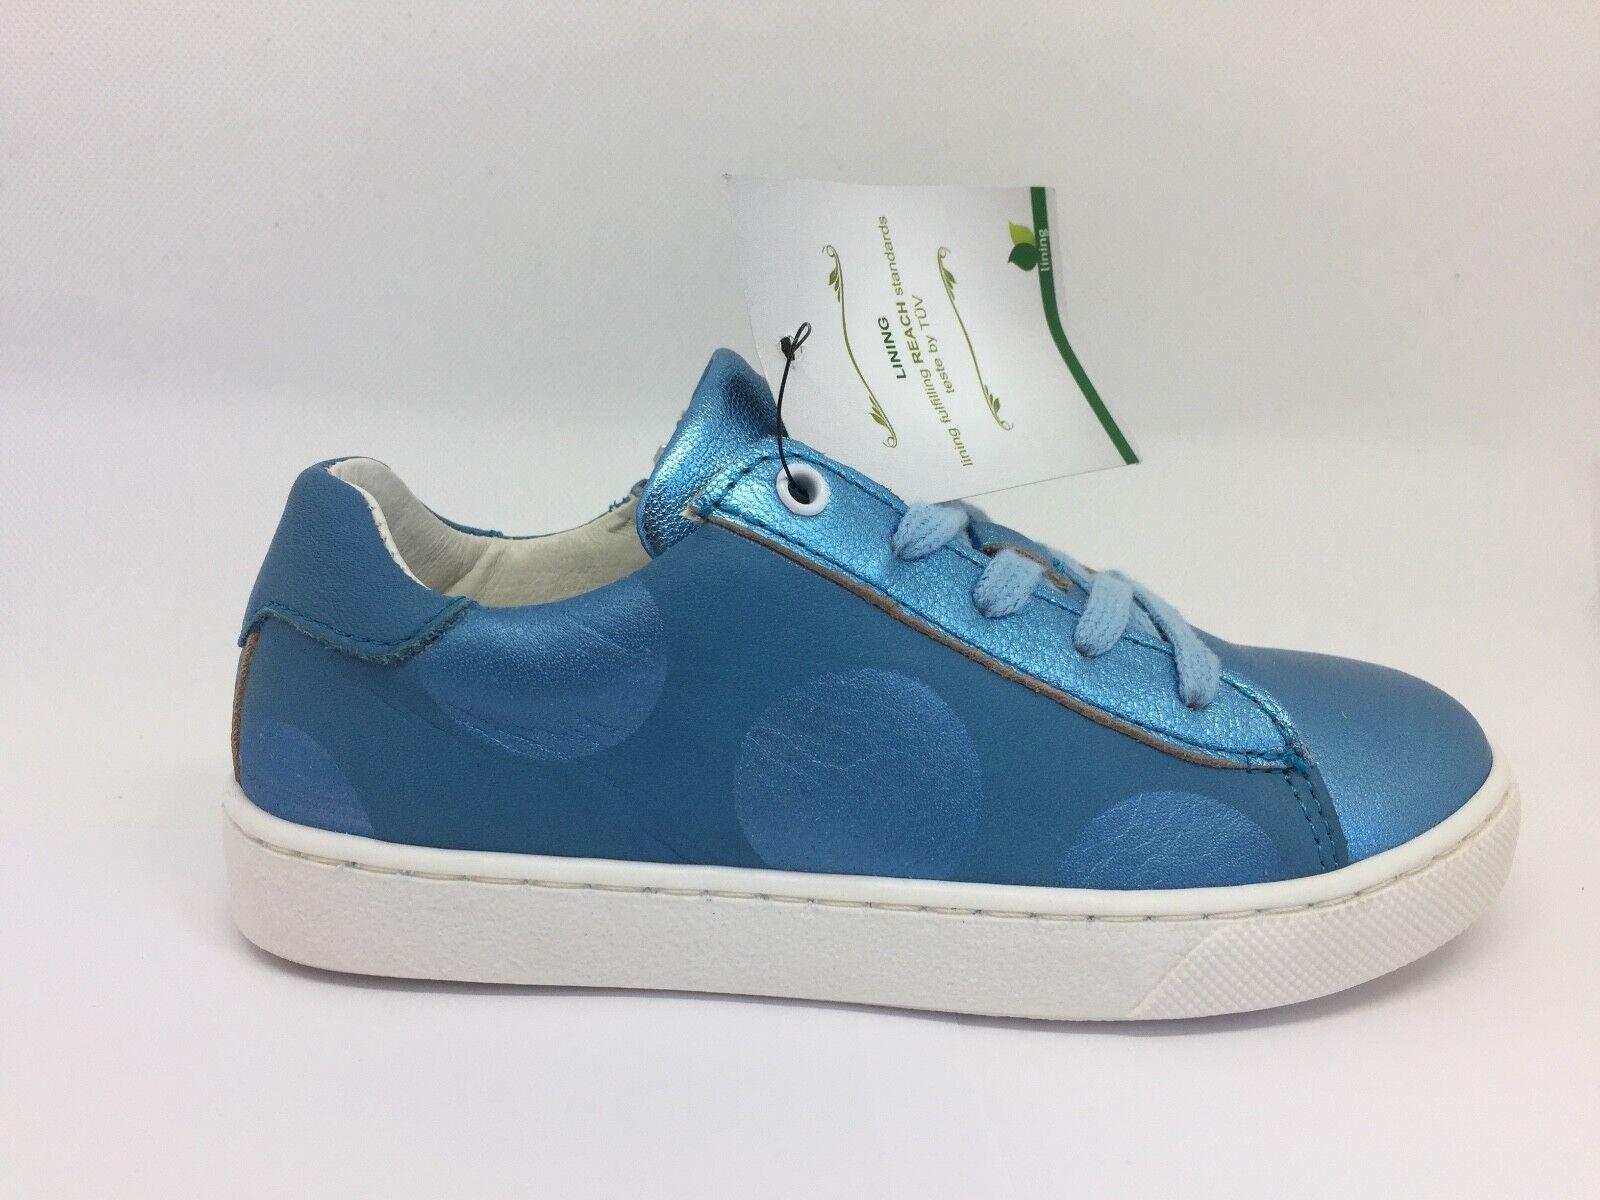 Telyoh Sneaker Schuhe, Schuhe, Schuhe, Gr. 38, Blau, NEU, VK 790663